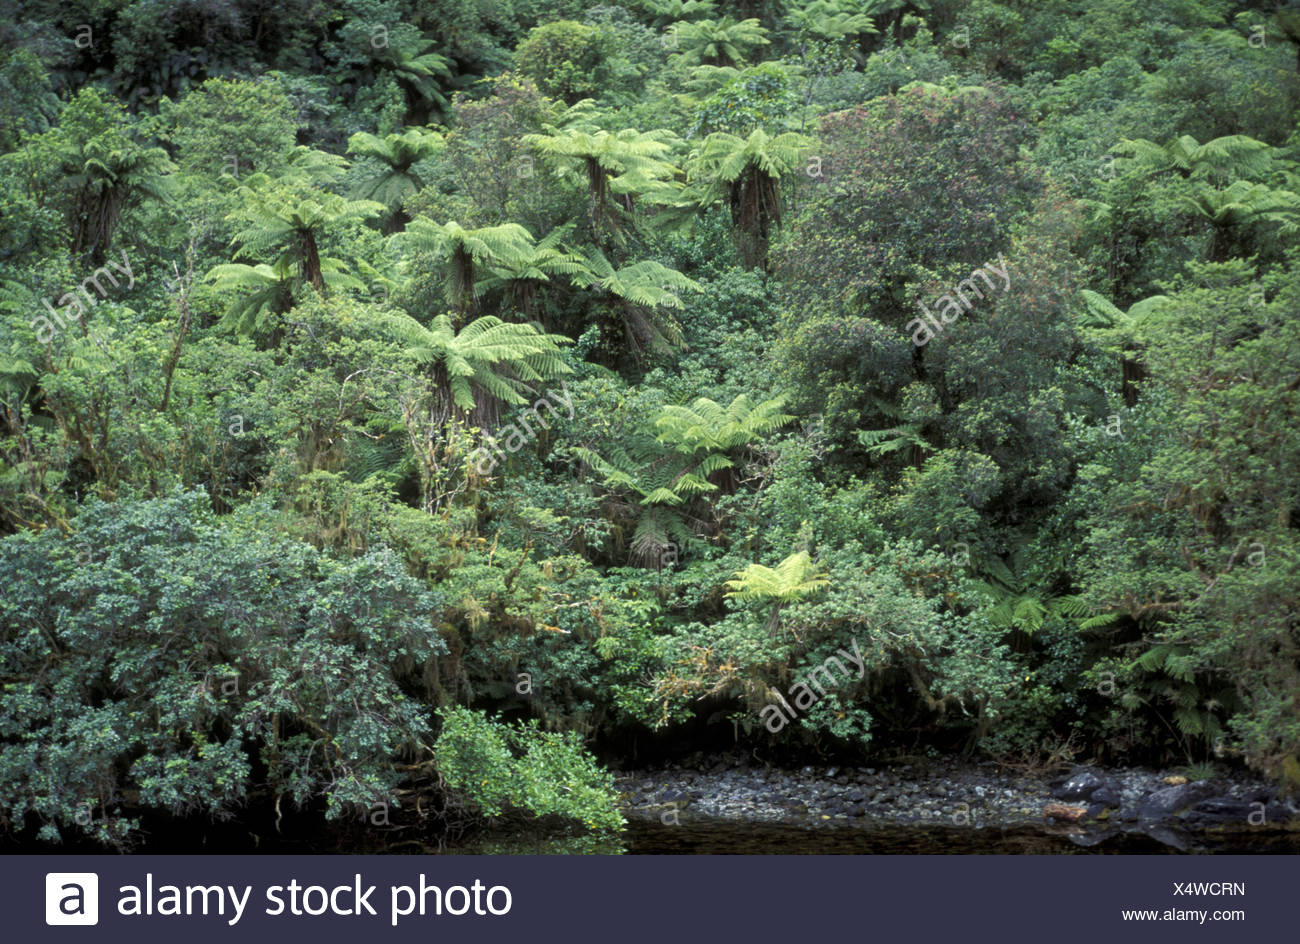 rainforest with ferns, New Zealand Stock Photo